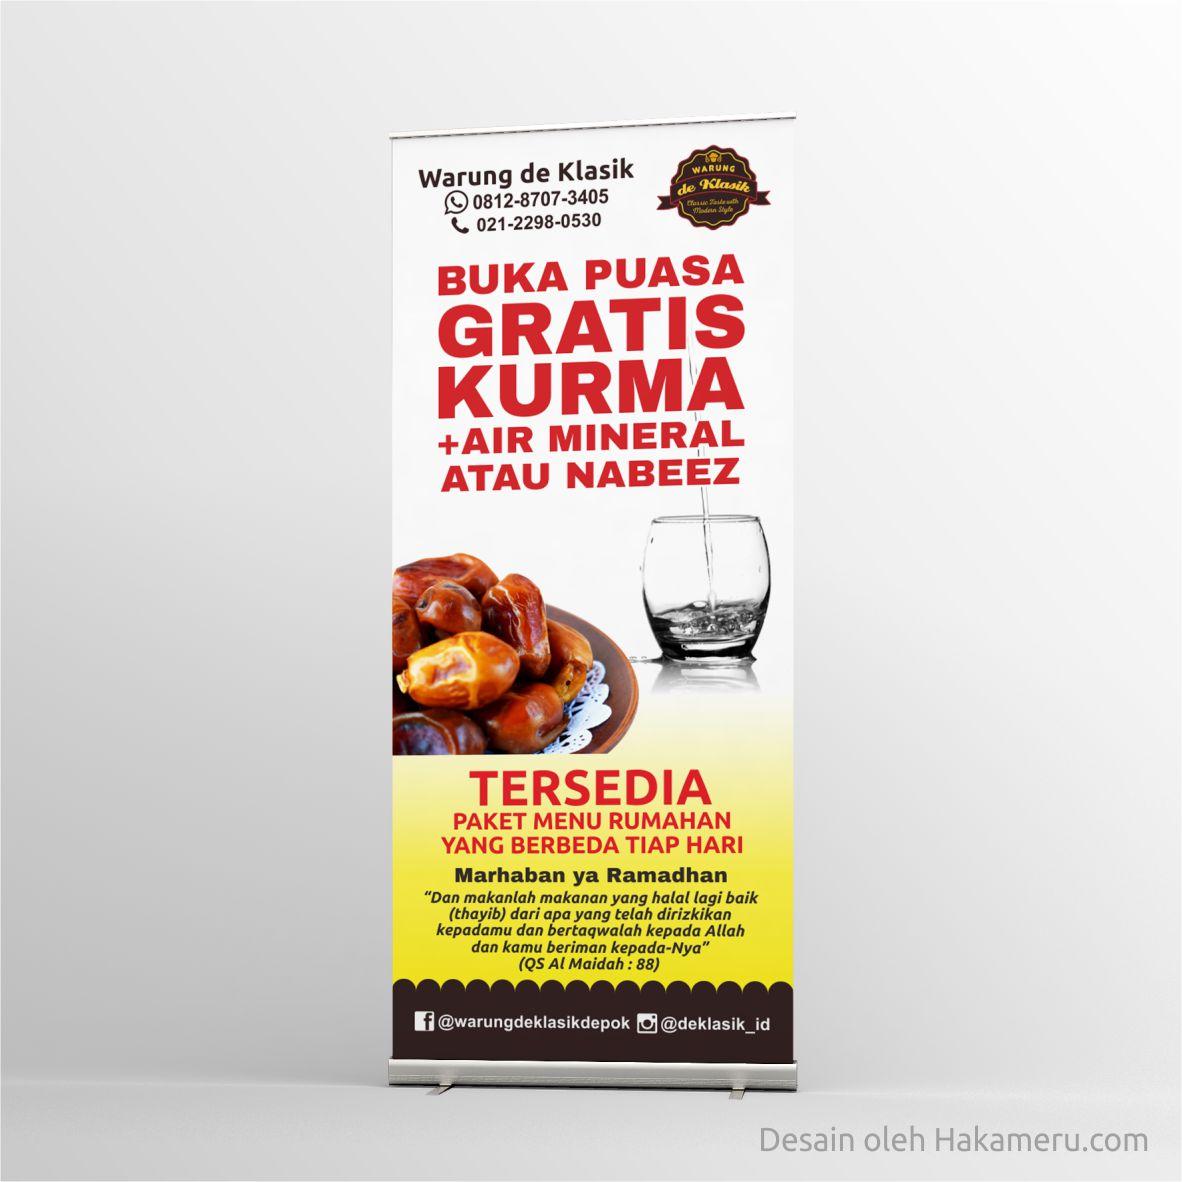 Desain roll up banner (roll banner) untuk warung de Klasik Depok - Jasa desain grafis online Hakameru